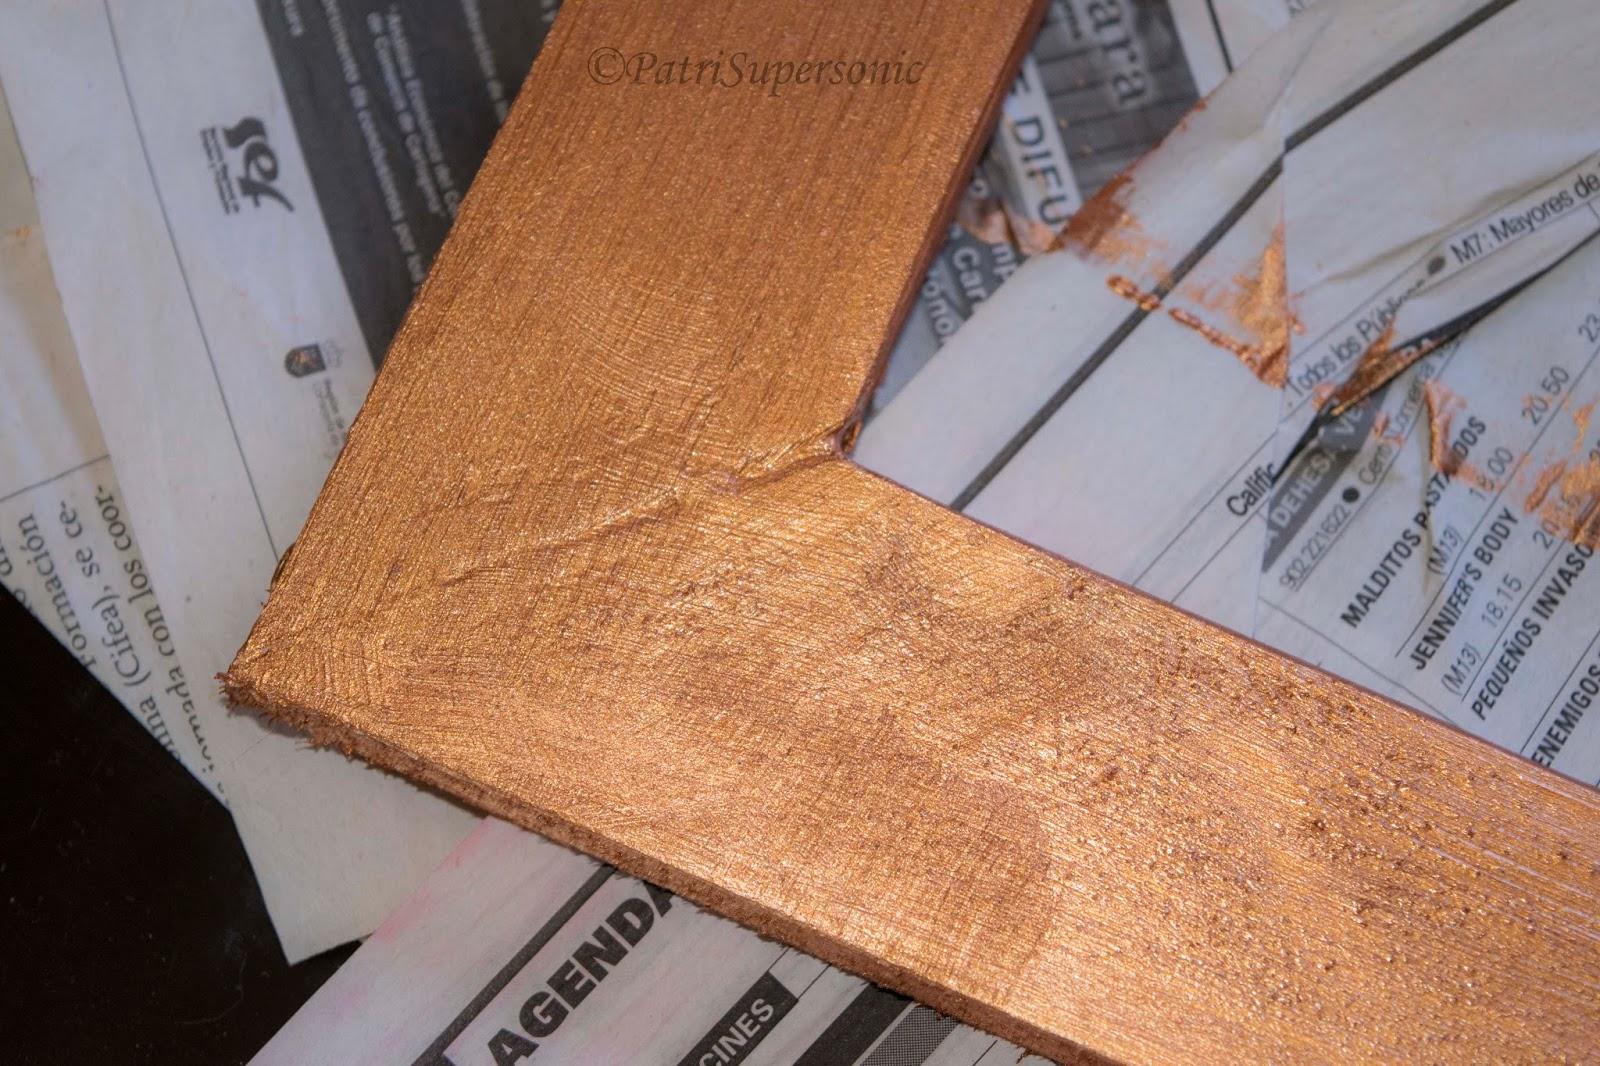 PatriSupersonic: Tablero customizado/ Handmade Board